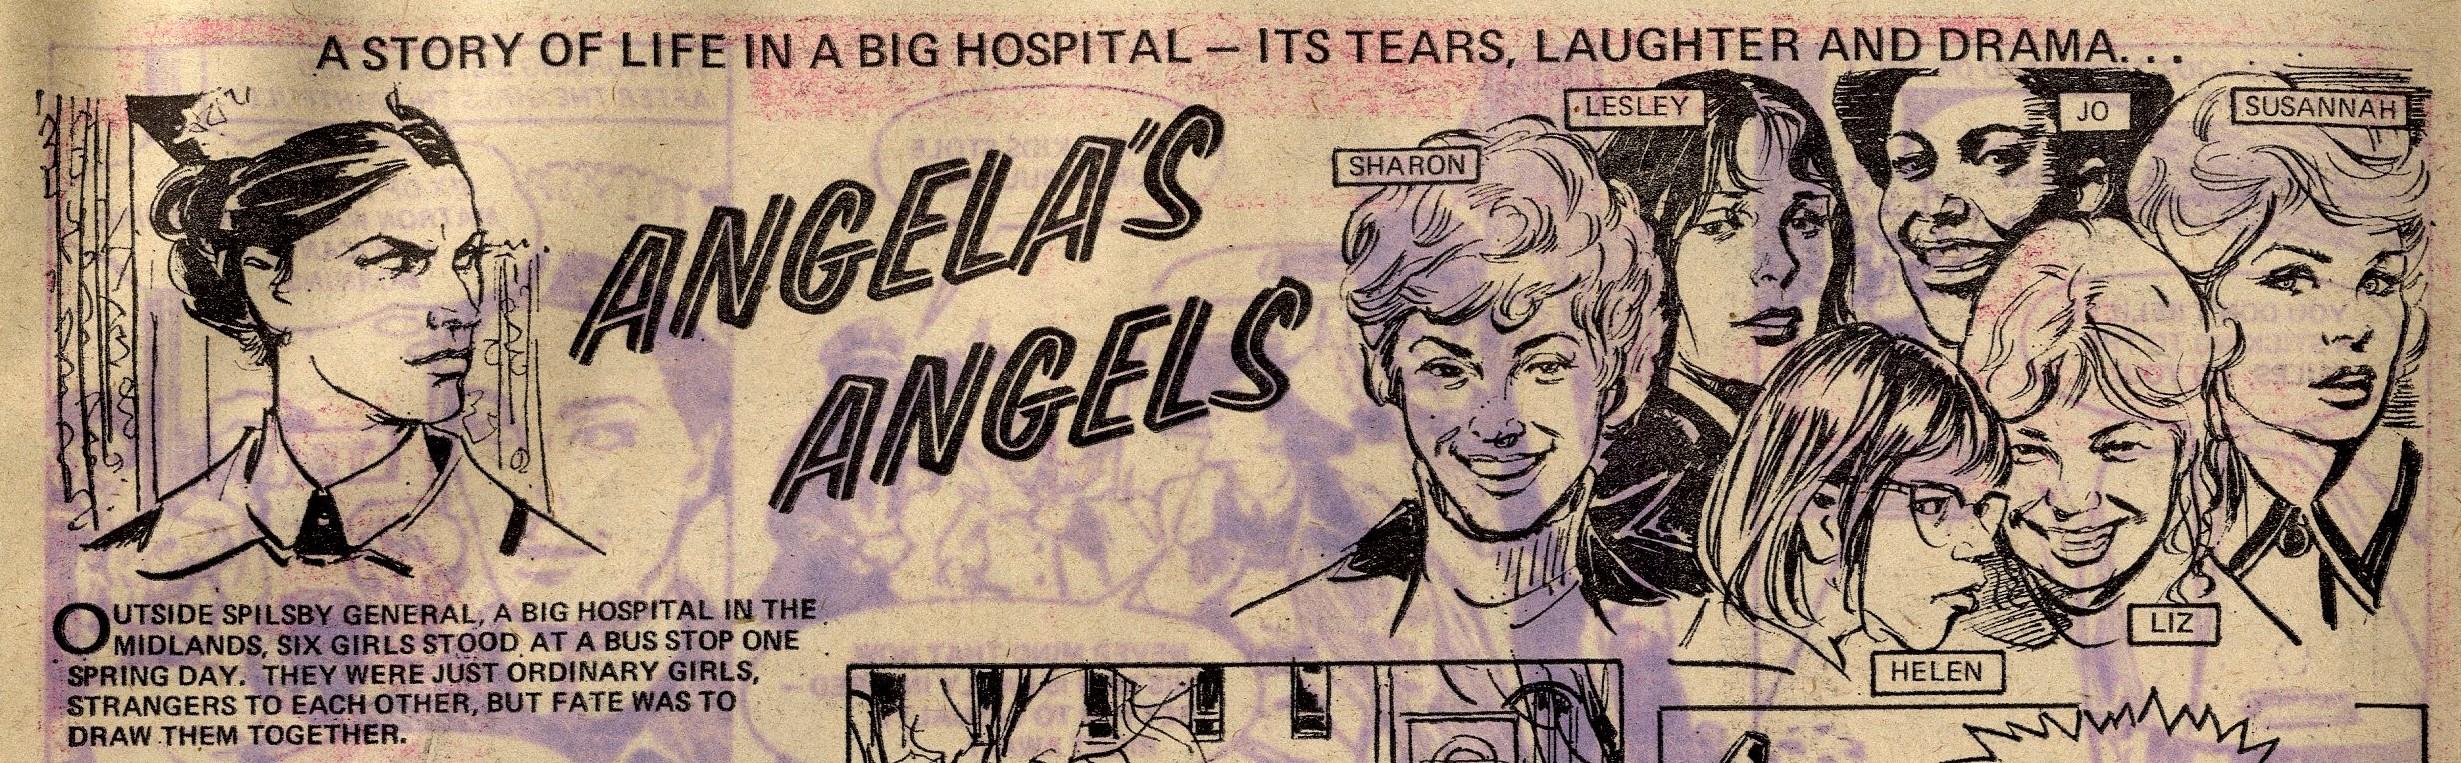 Angela's Angels: Leo Davy (artist)